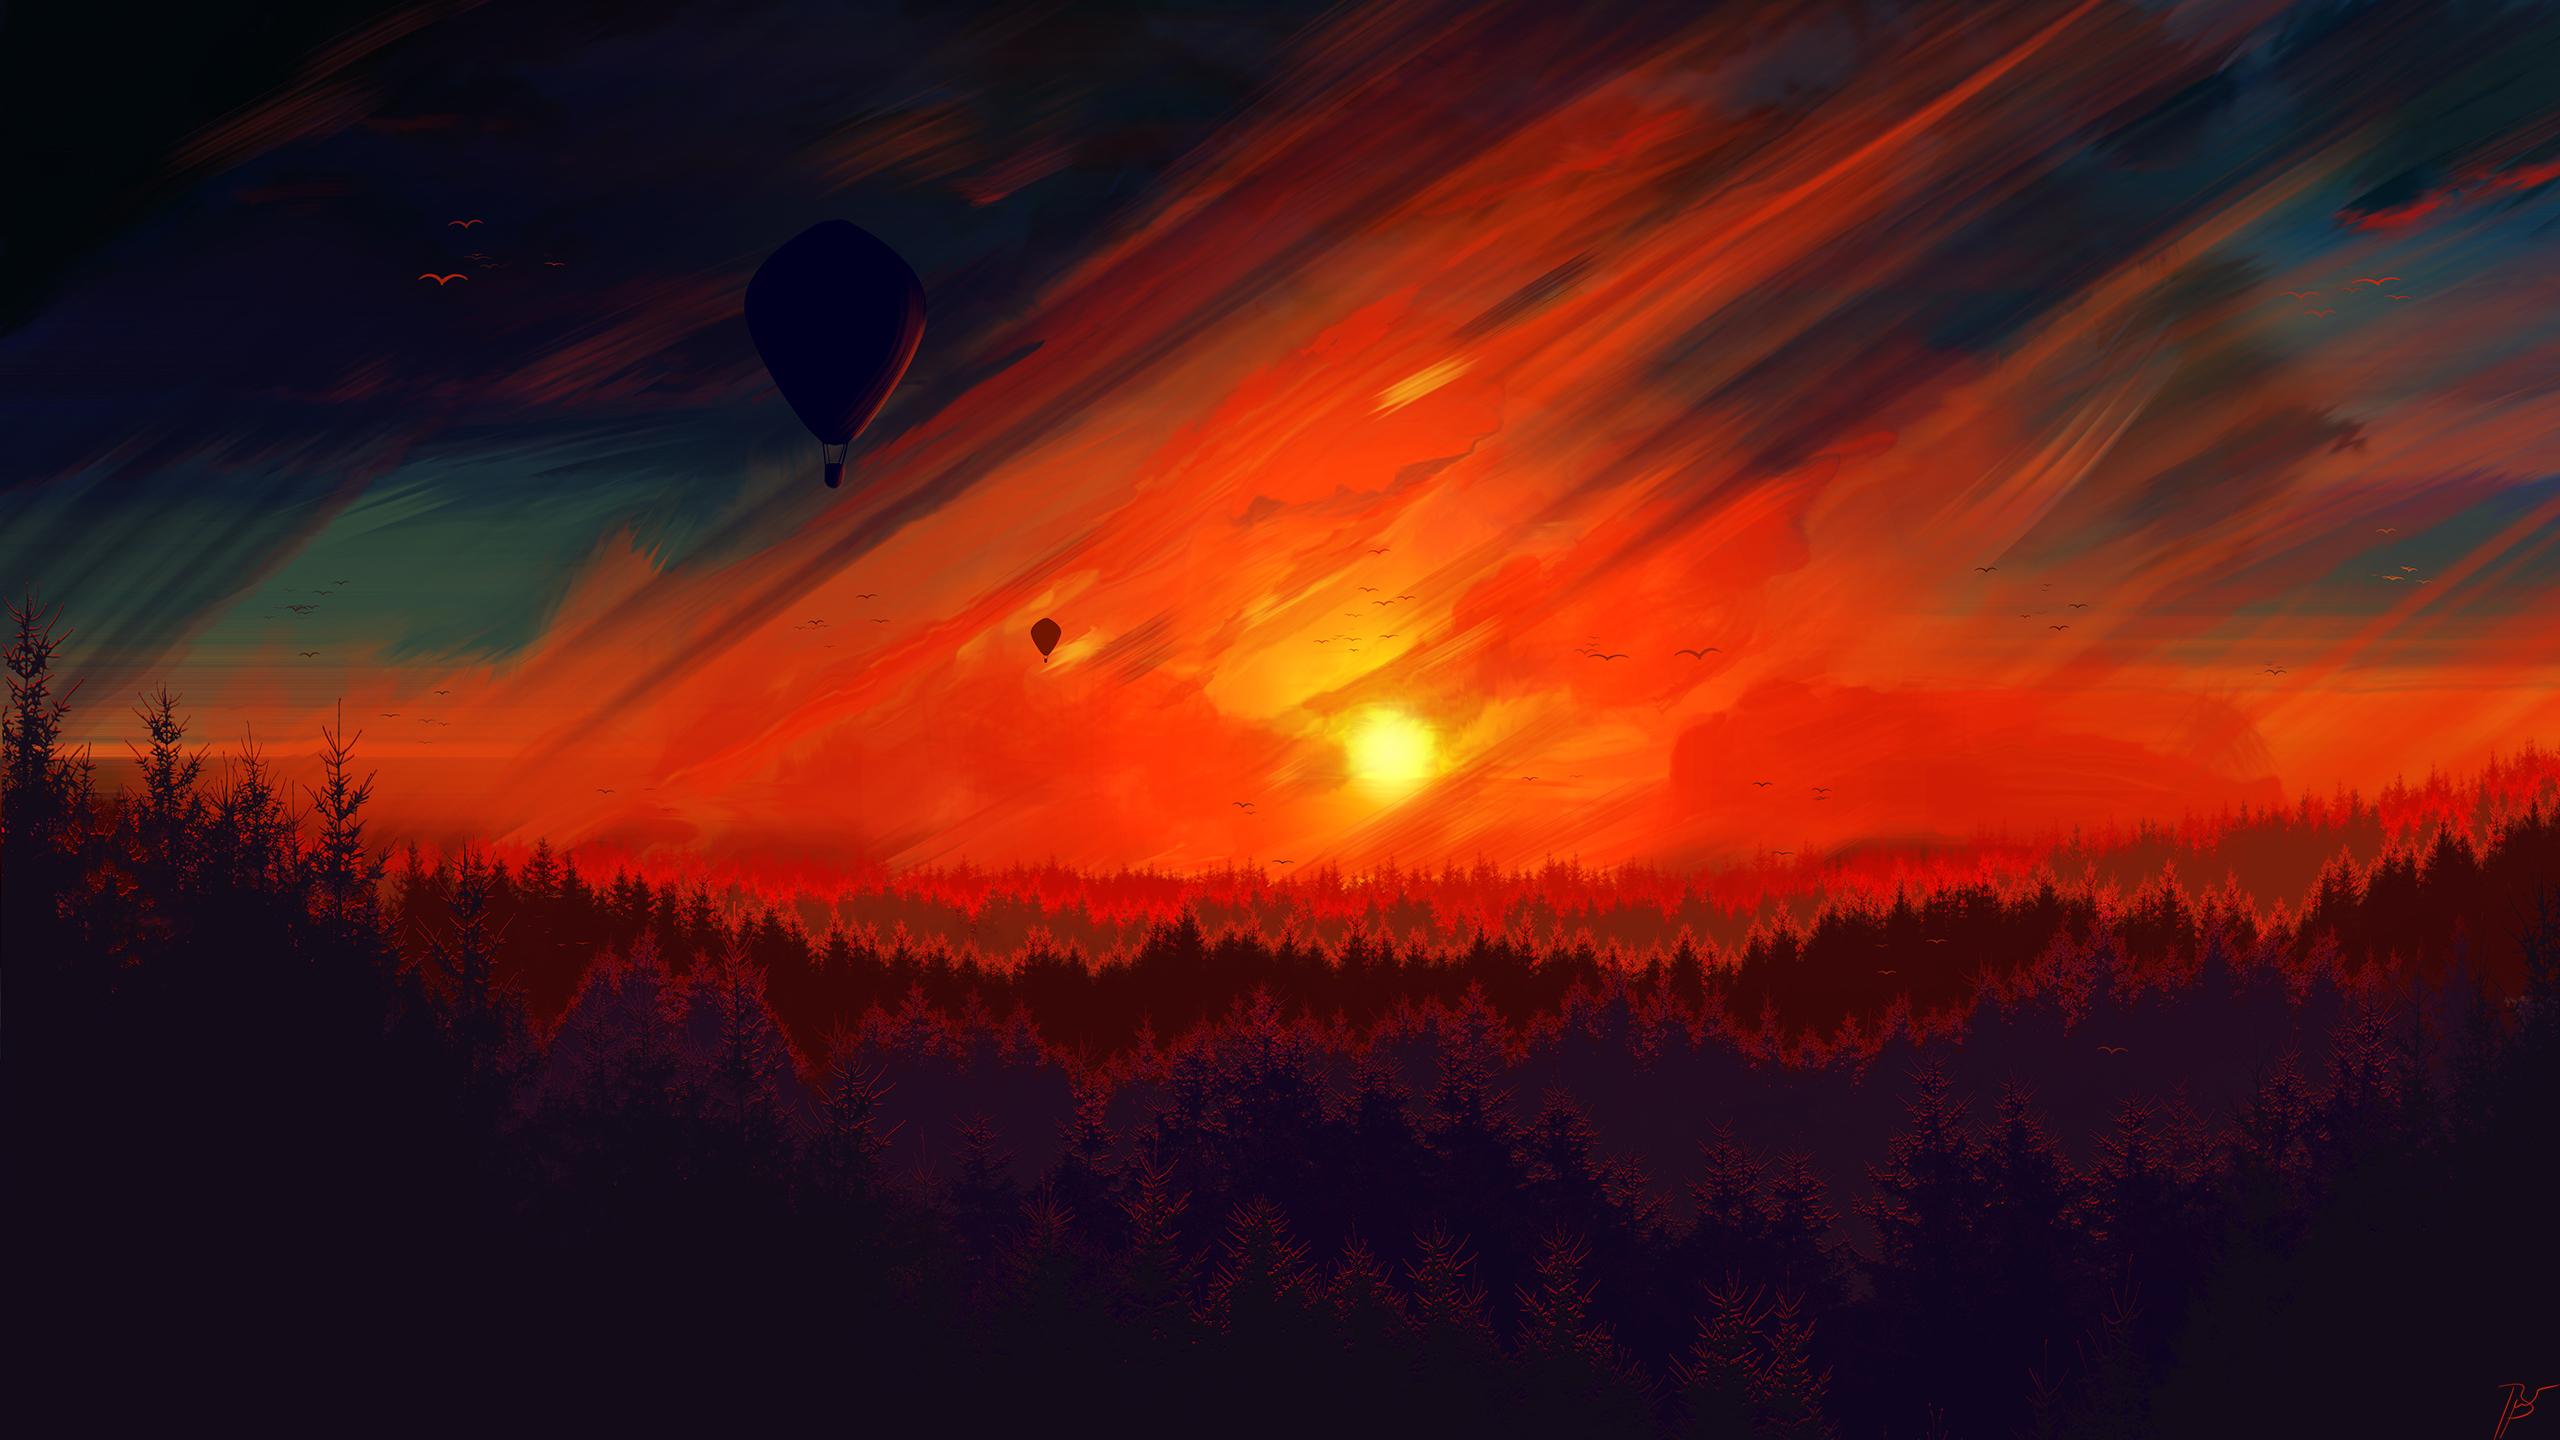 General 2560x1440 JoeyJazz sunset landscape digital digital painting hot air balloons forest birds red